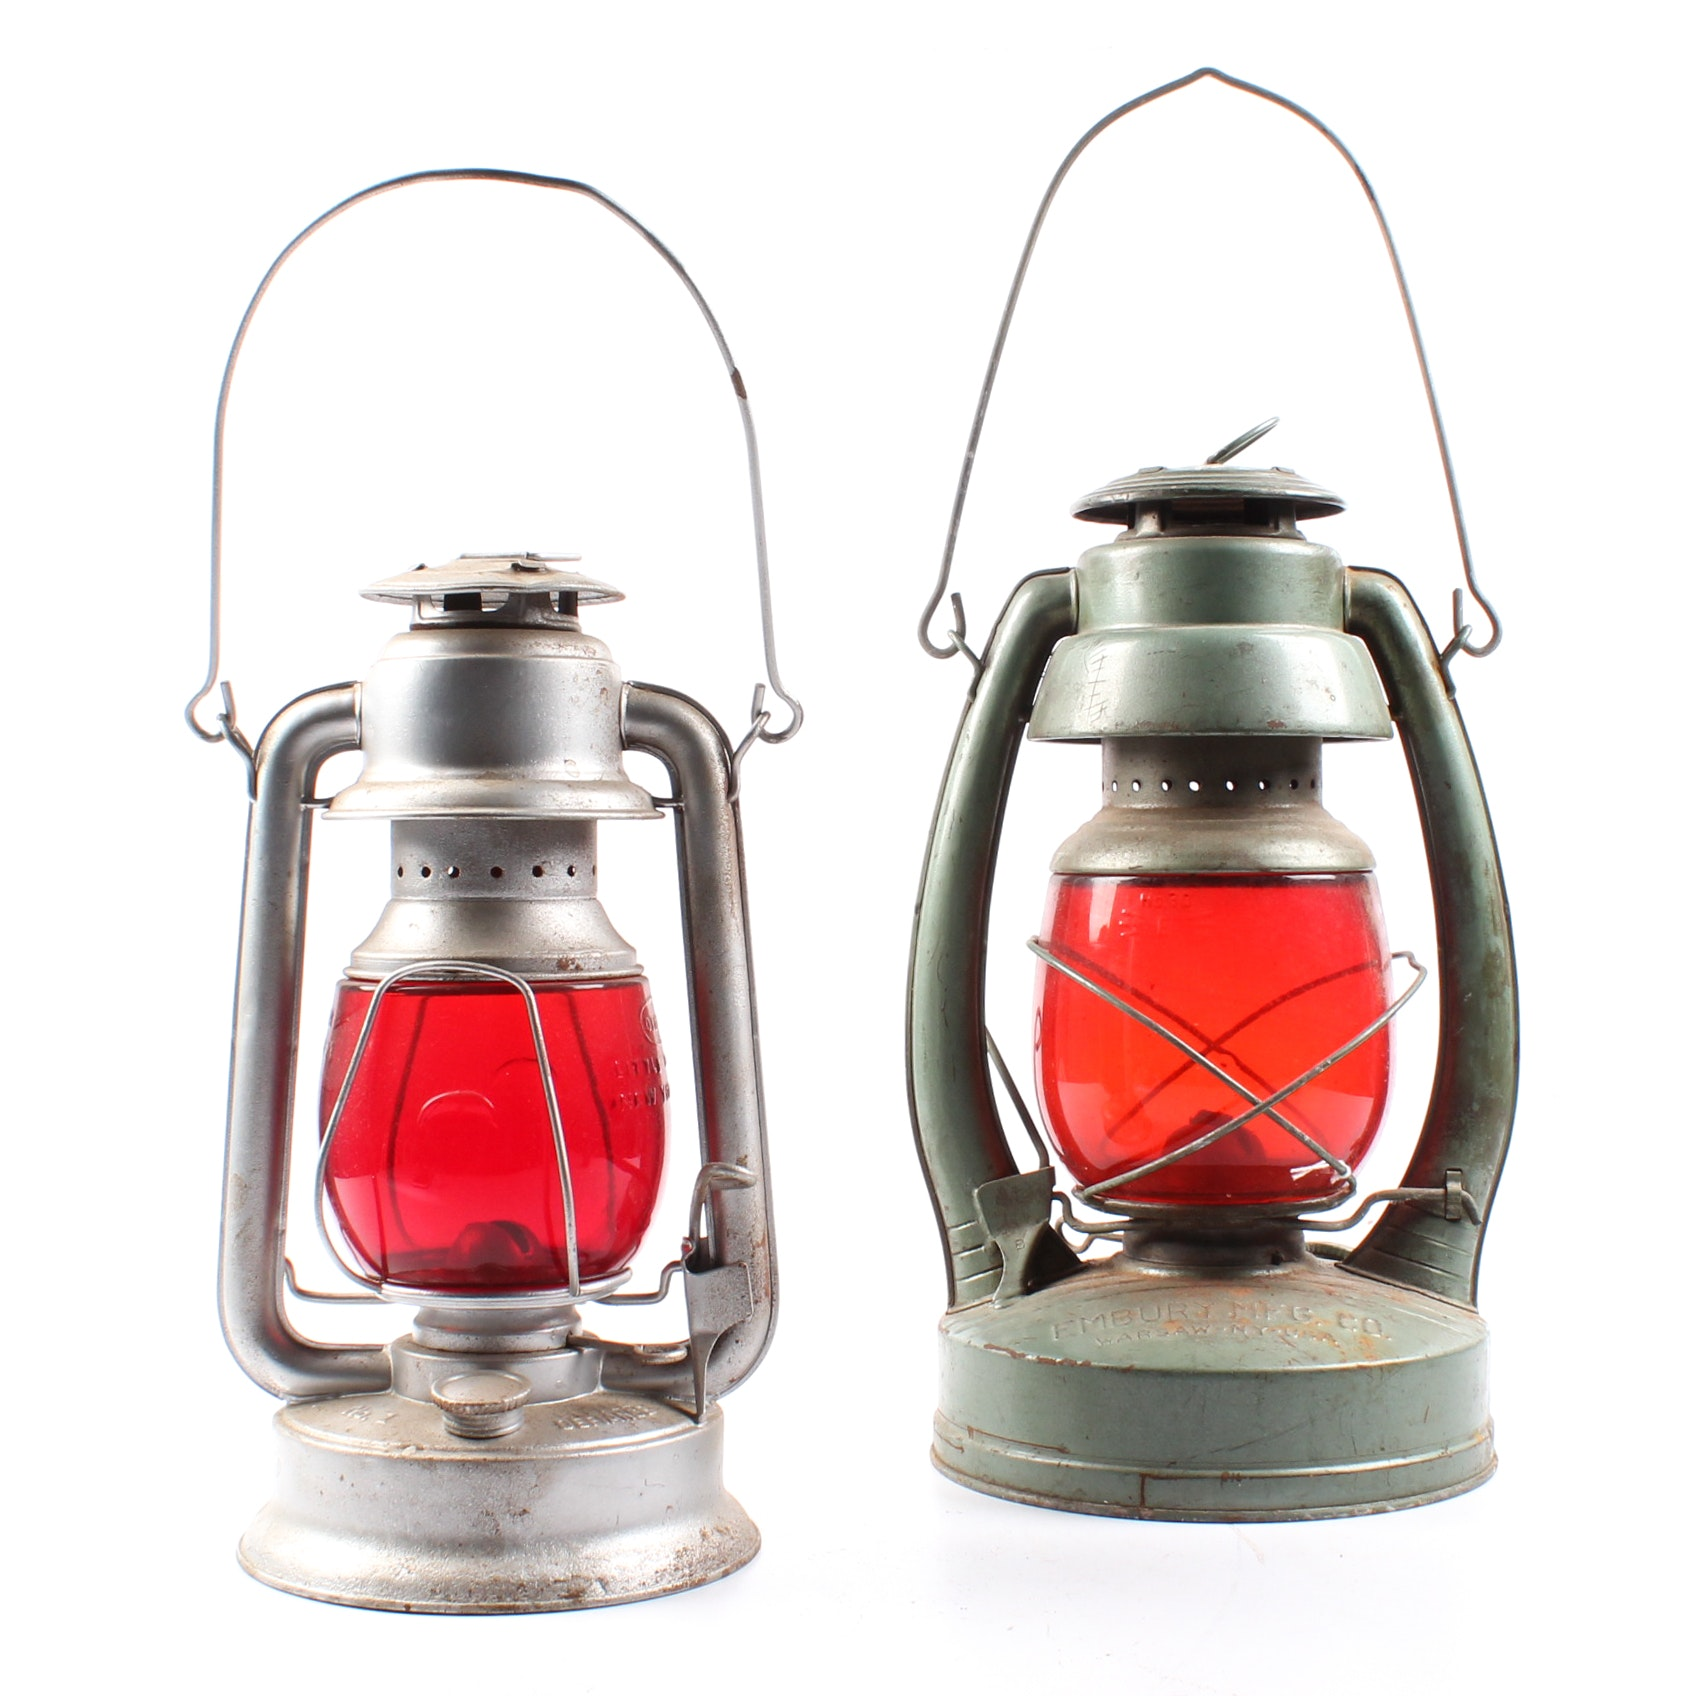 Vintage Kerosene Lanterns with Red Glass Globes